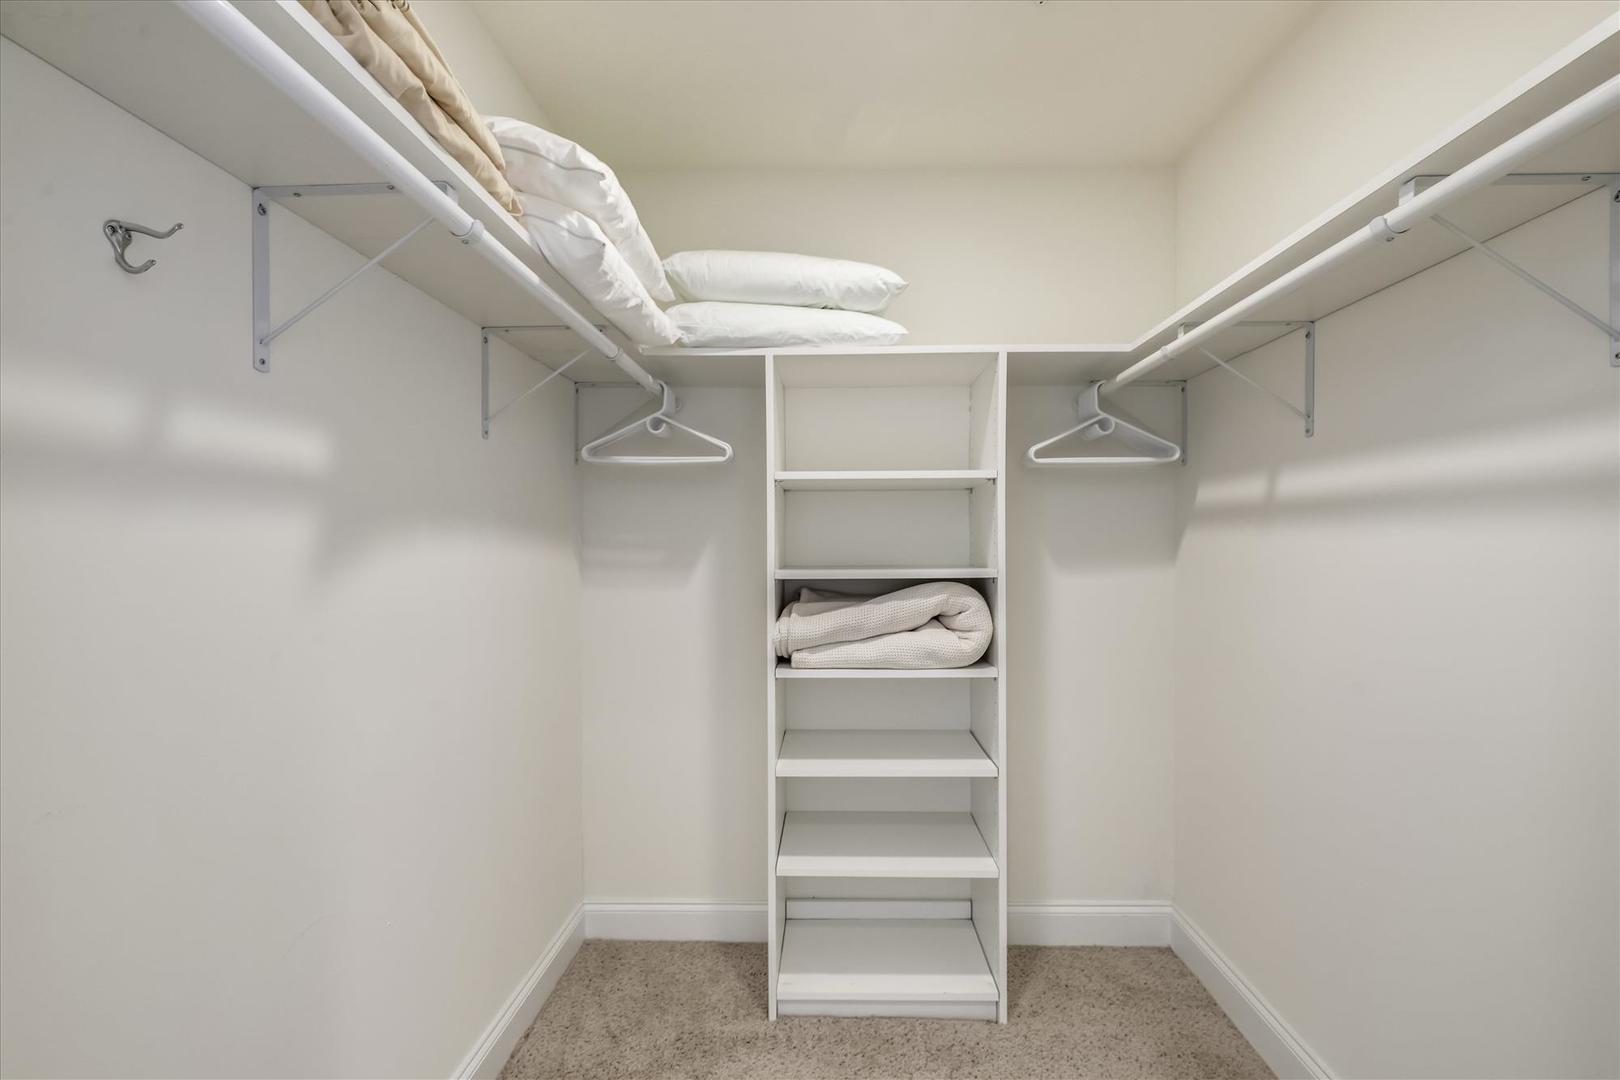 South Beach 304 - Walk-In Closet